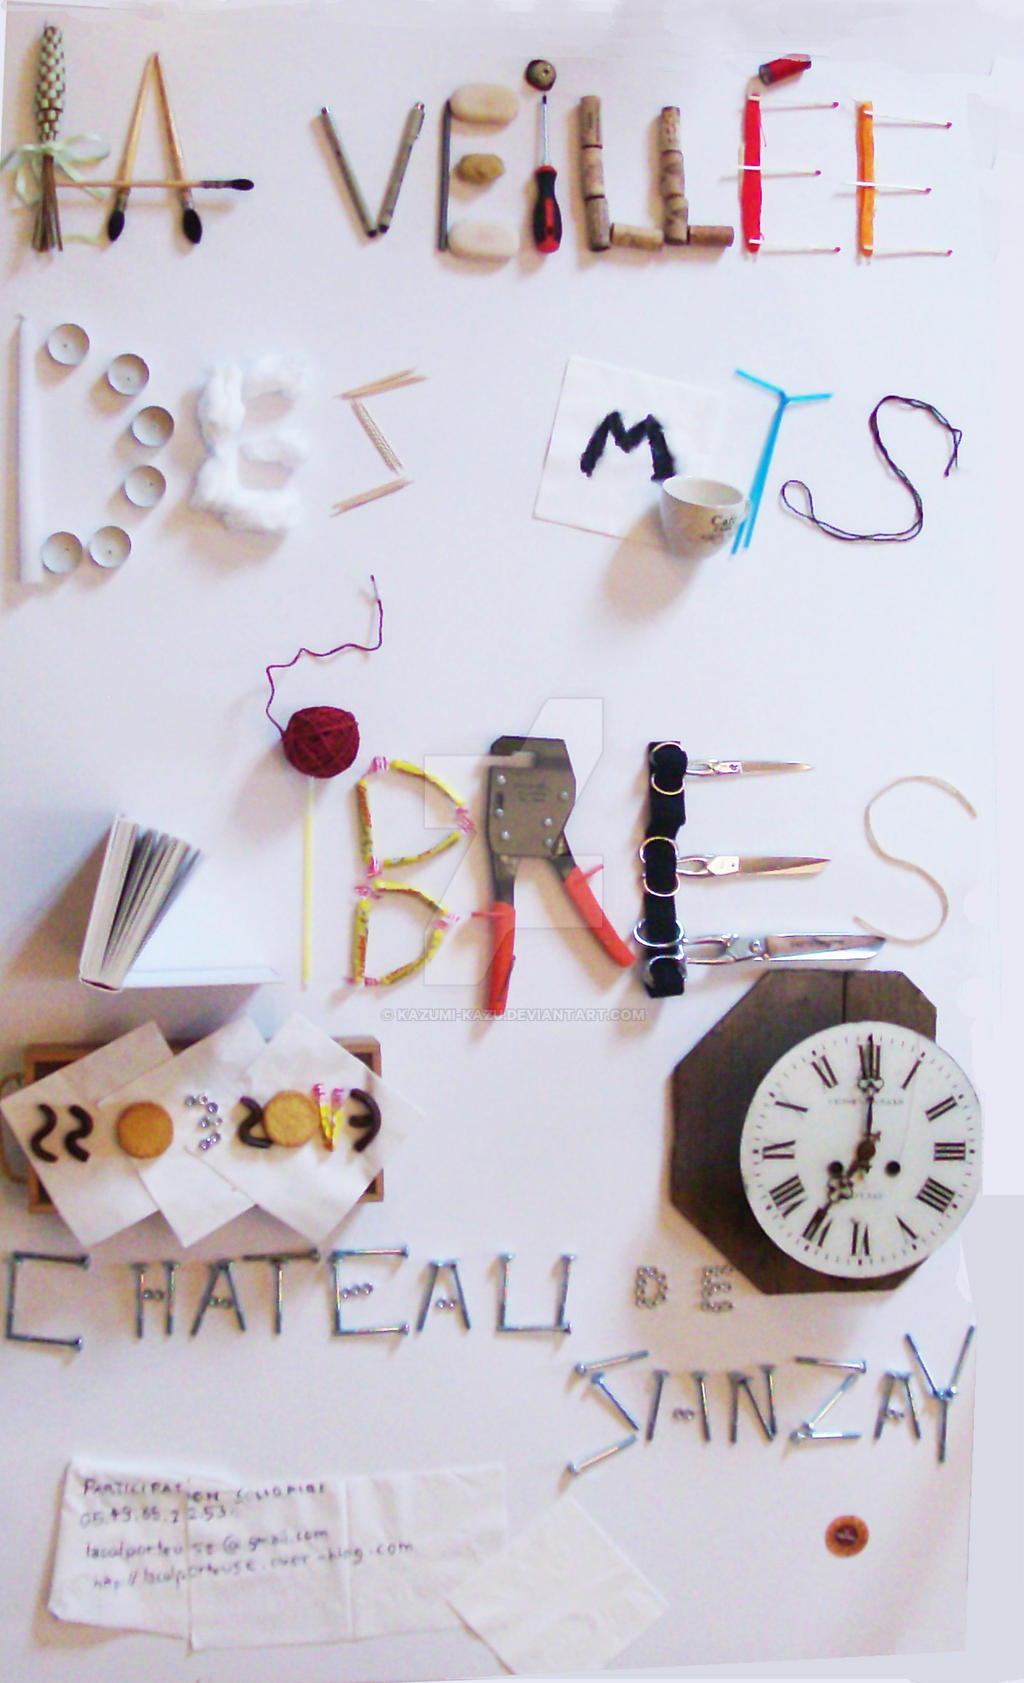 Affiche Typographie objets by Kazumi-Kazu